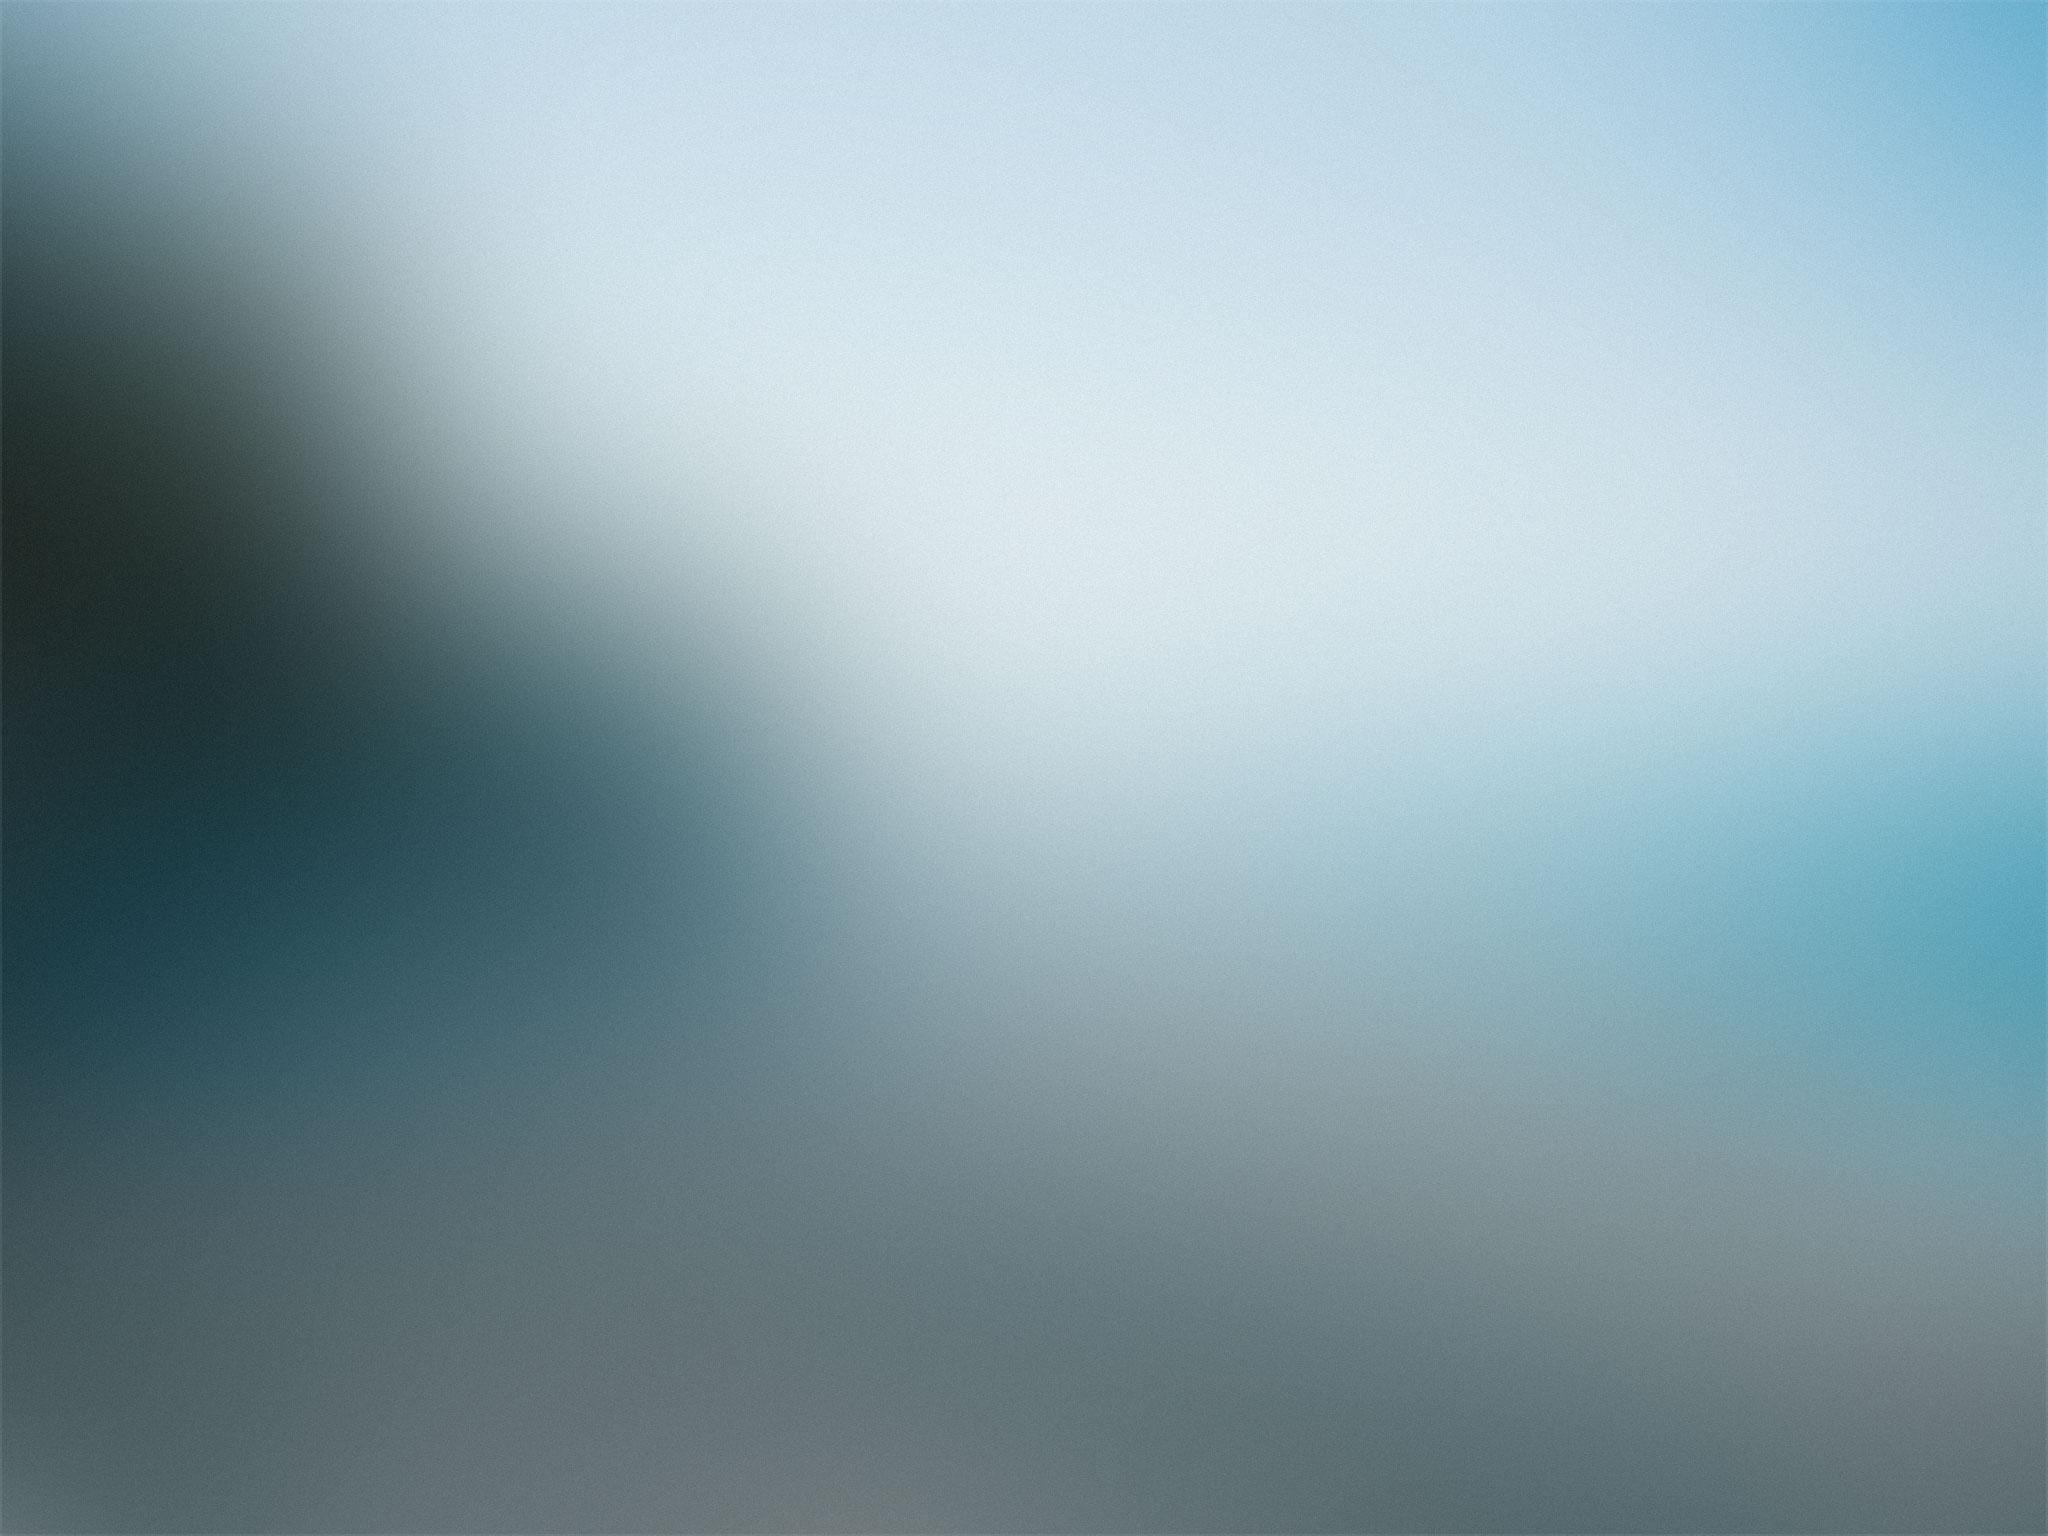 bg-blur-1